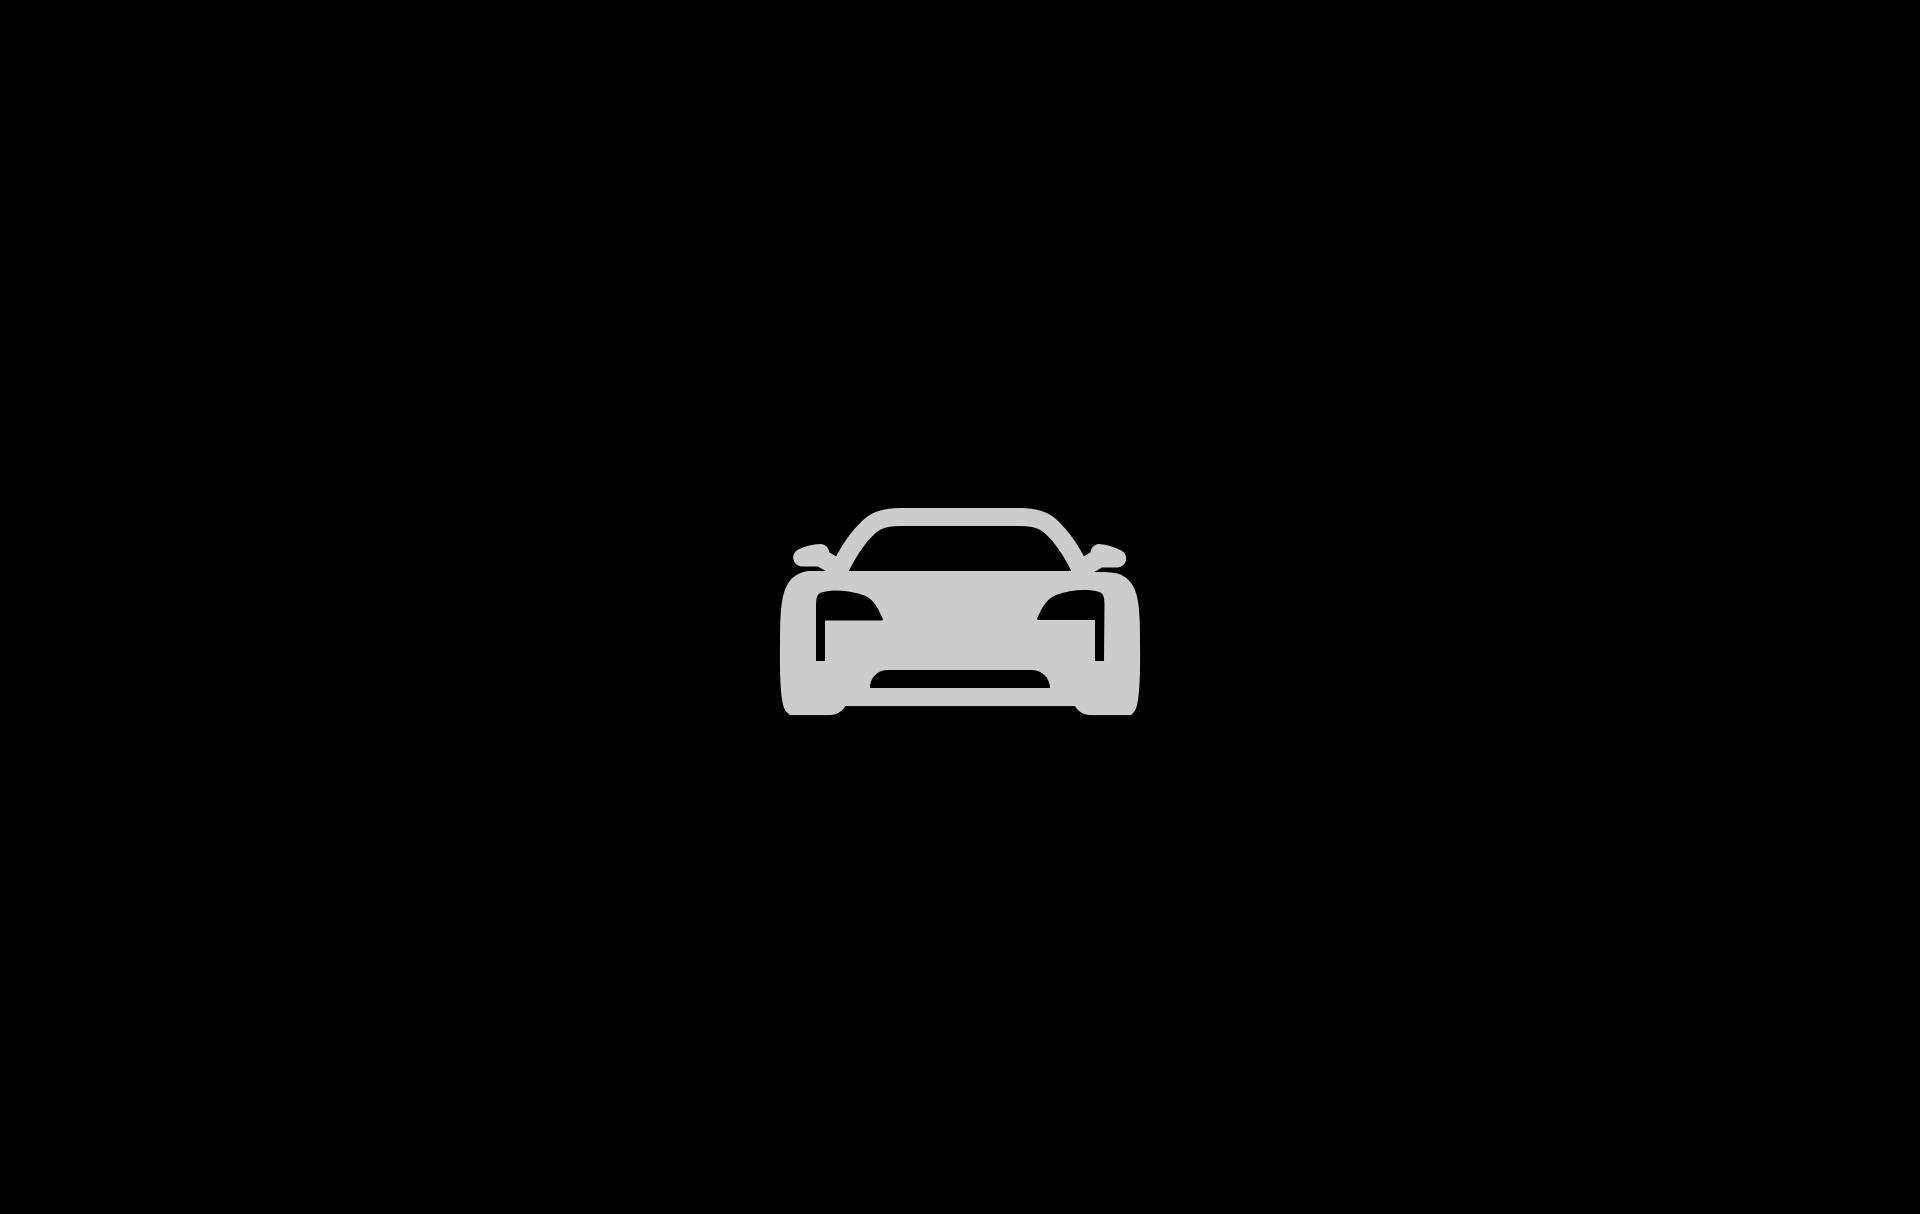 Porsche Iconset